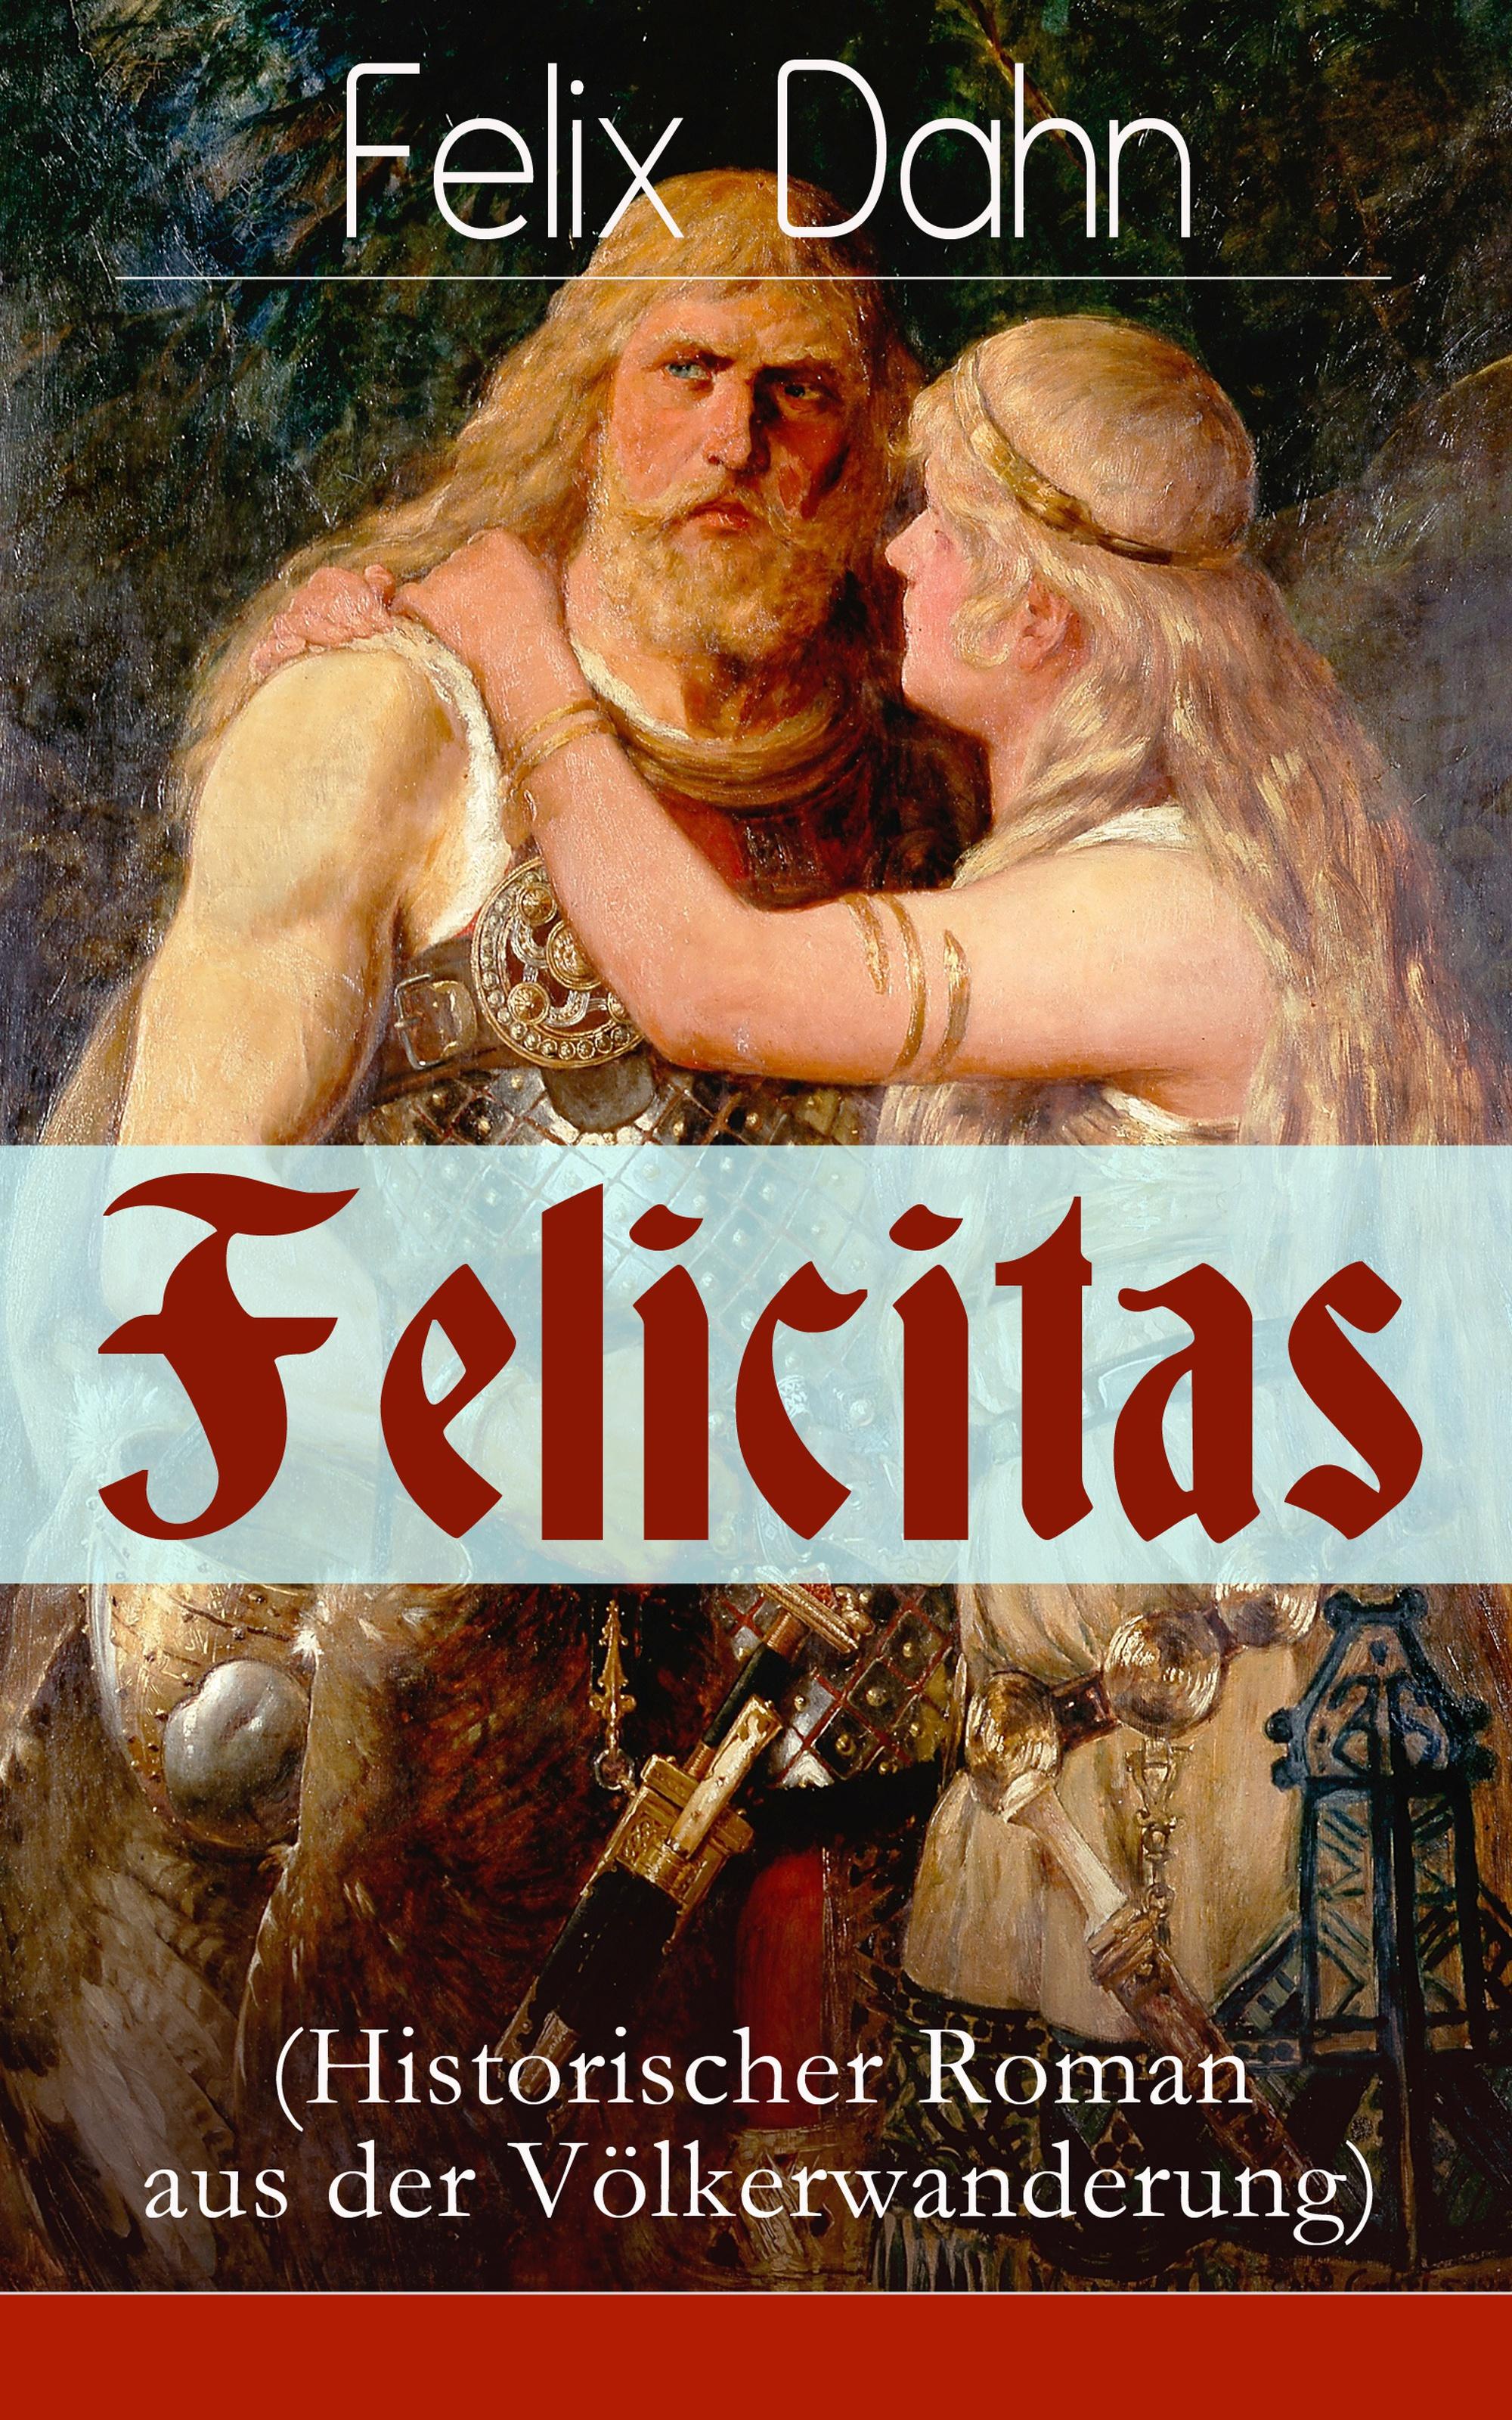 Felix Dahn Felicitas (Historischer Roman aus der Völkerwanderung)